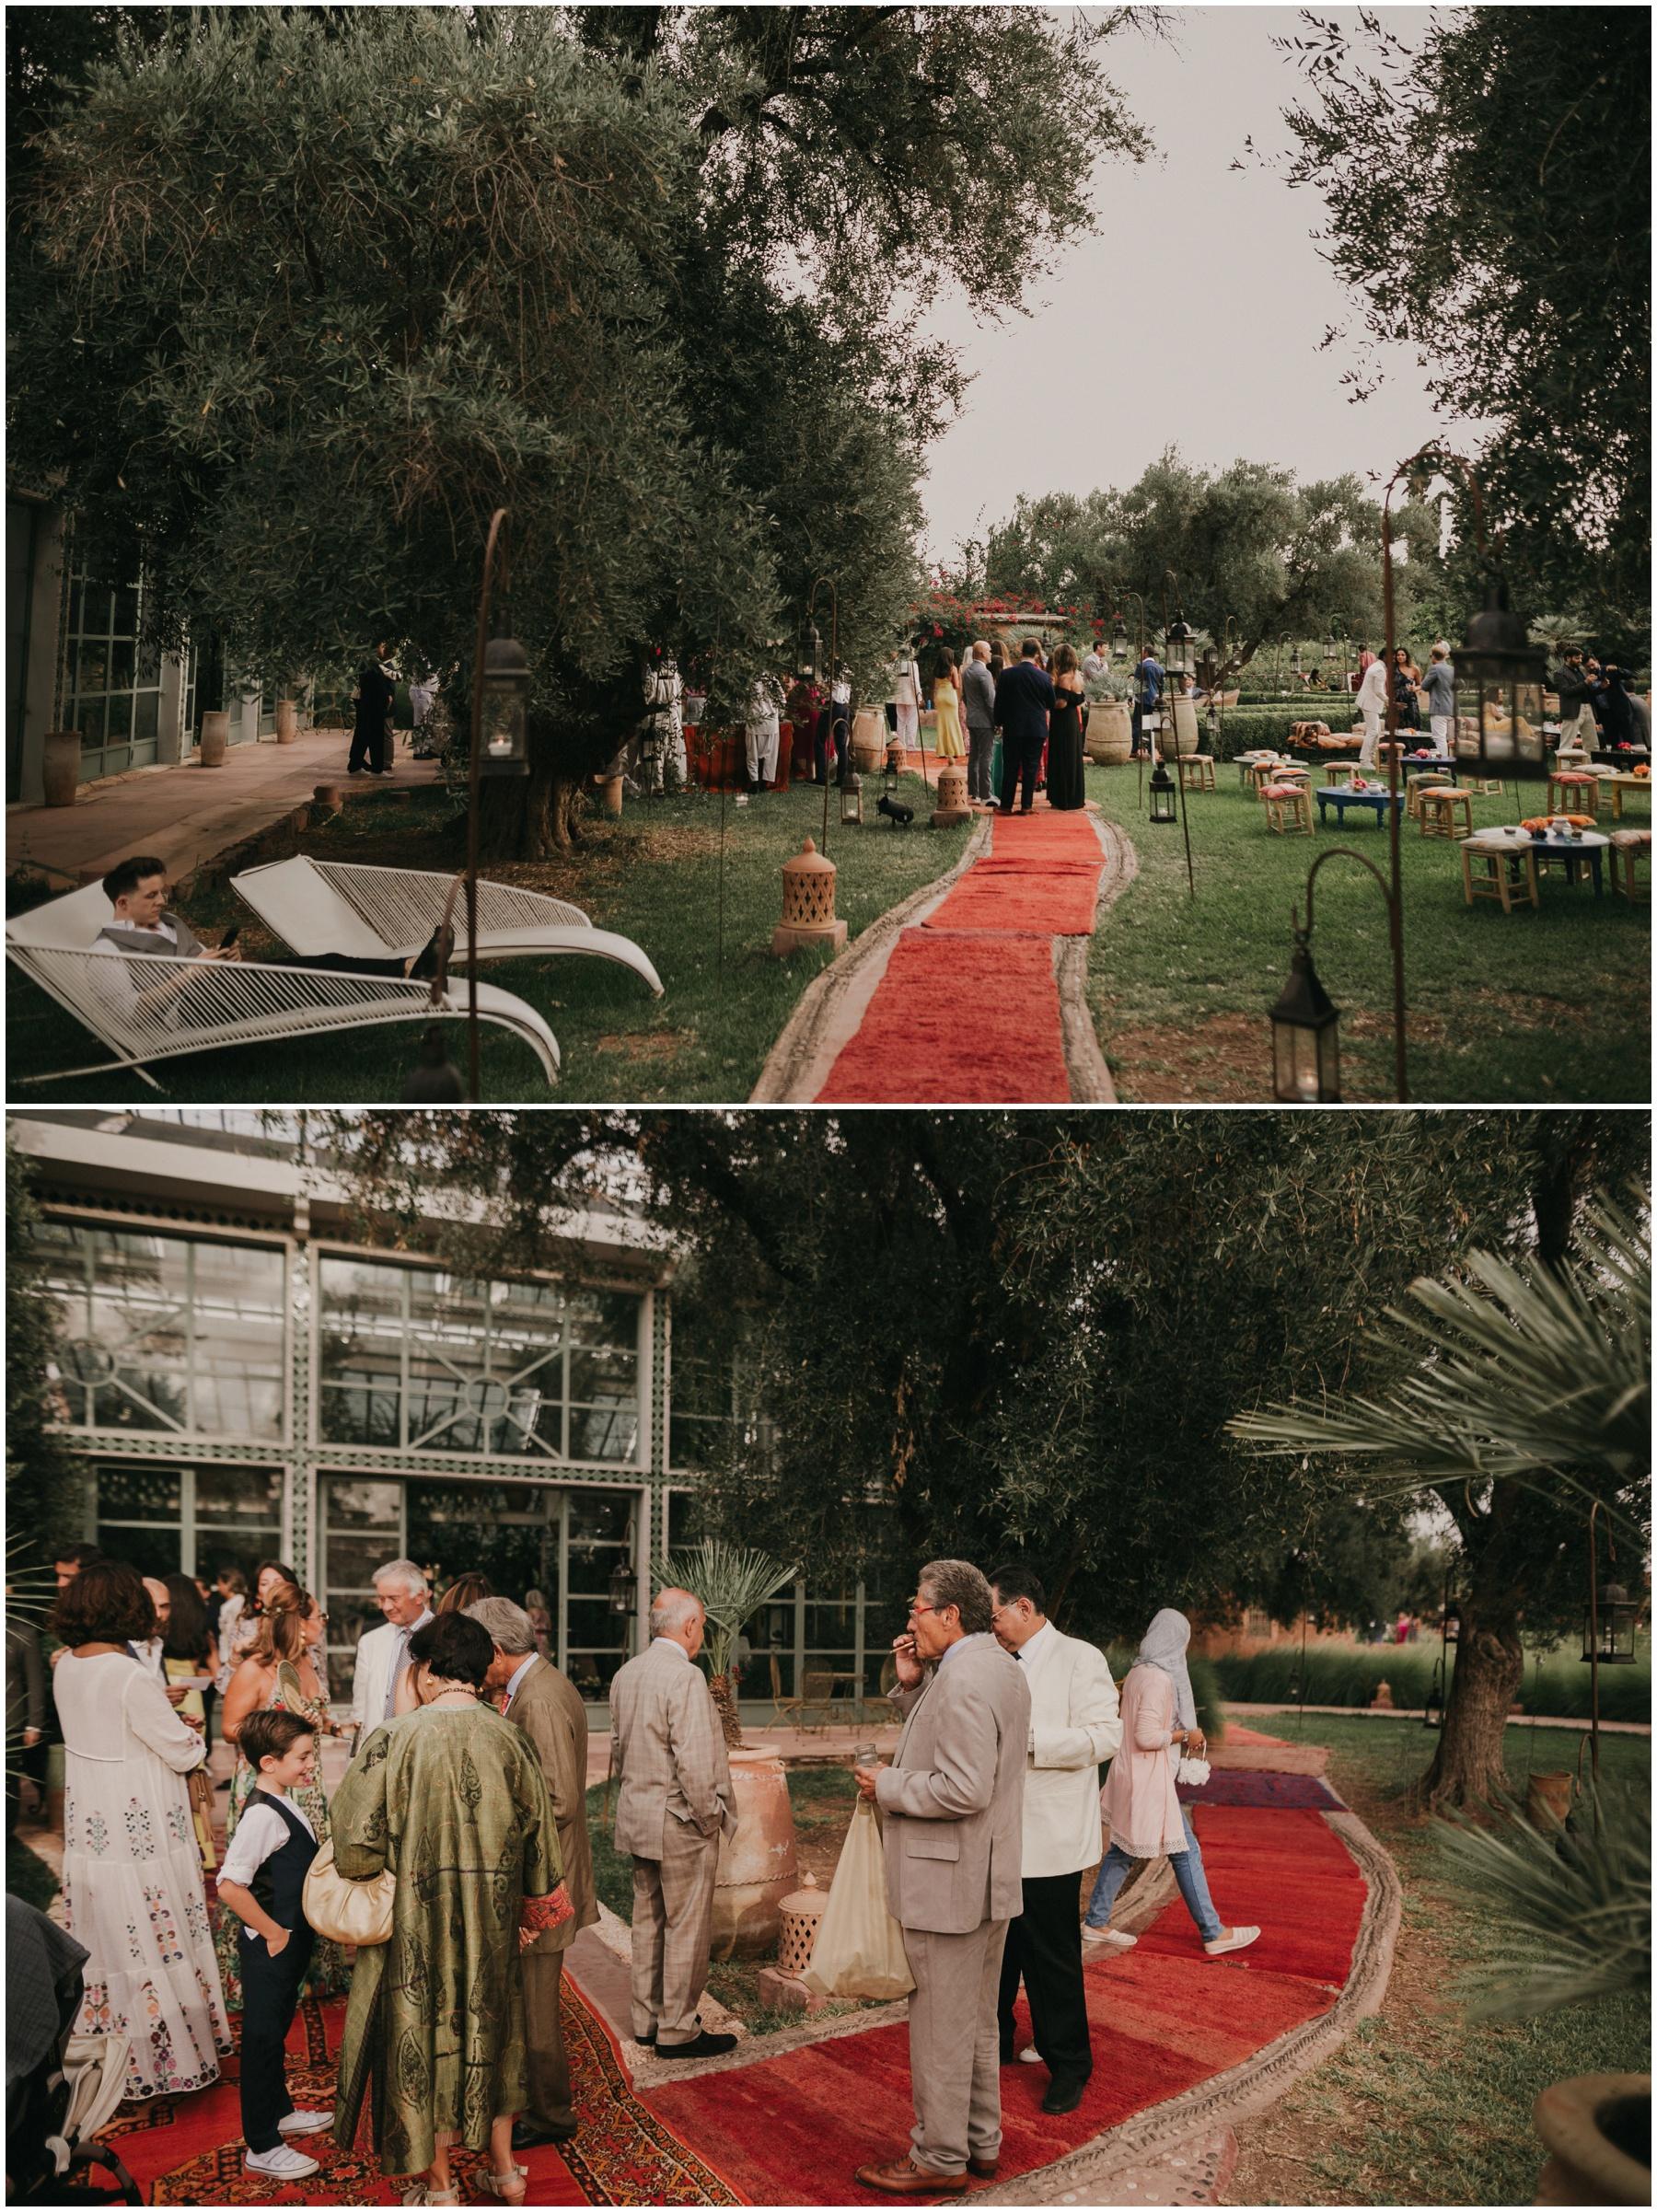 Marrakech Wedding Beldi Coutry Club 025.JPG